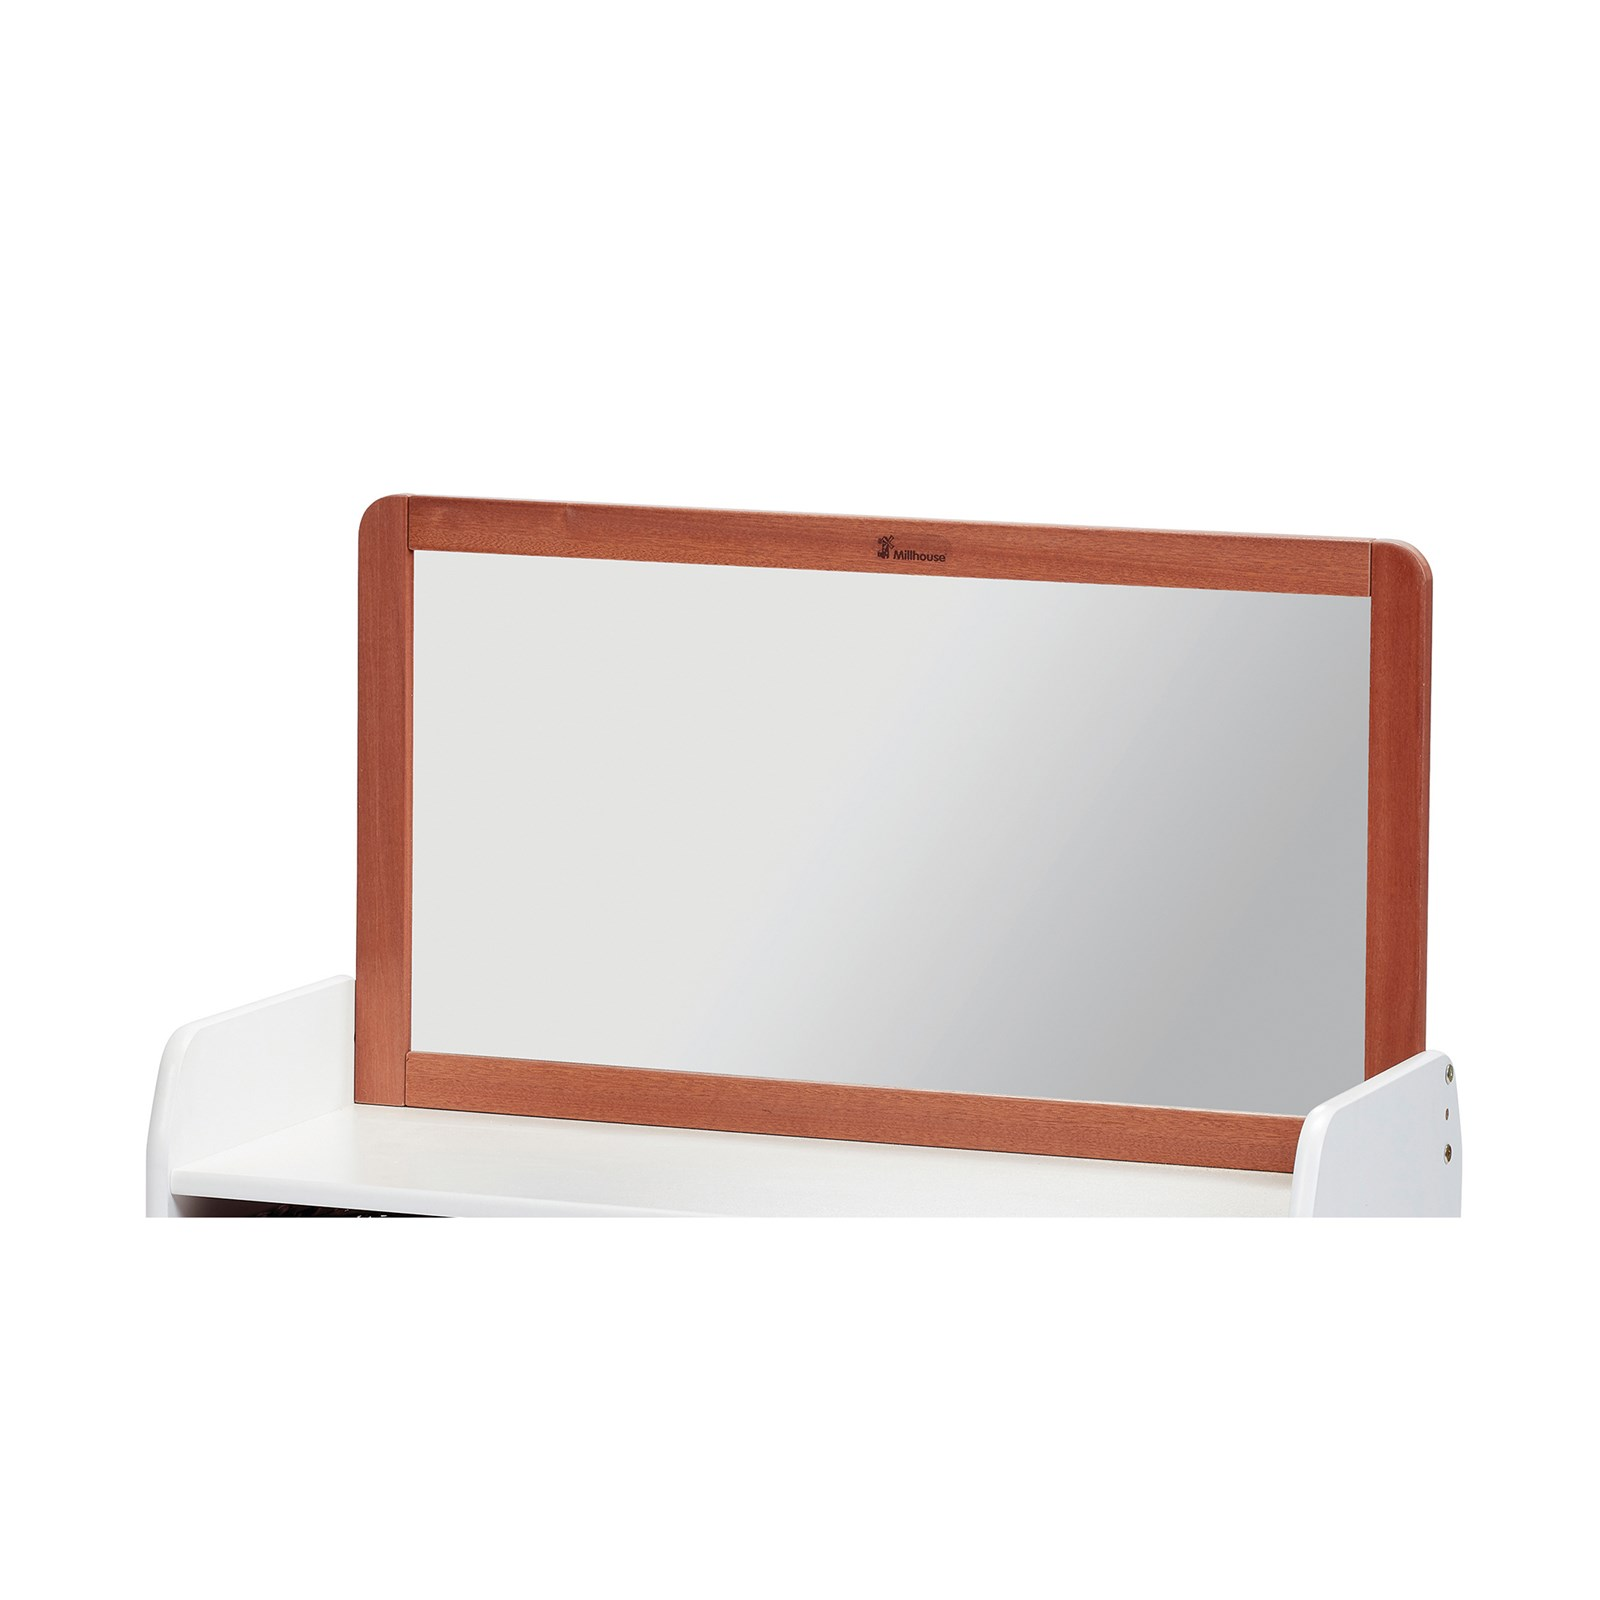 Mirror Add-On Panel